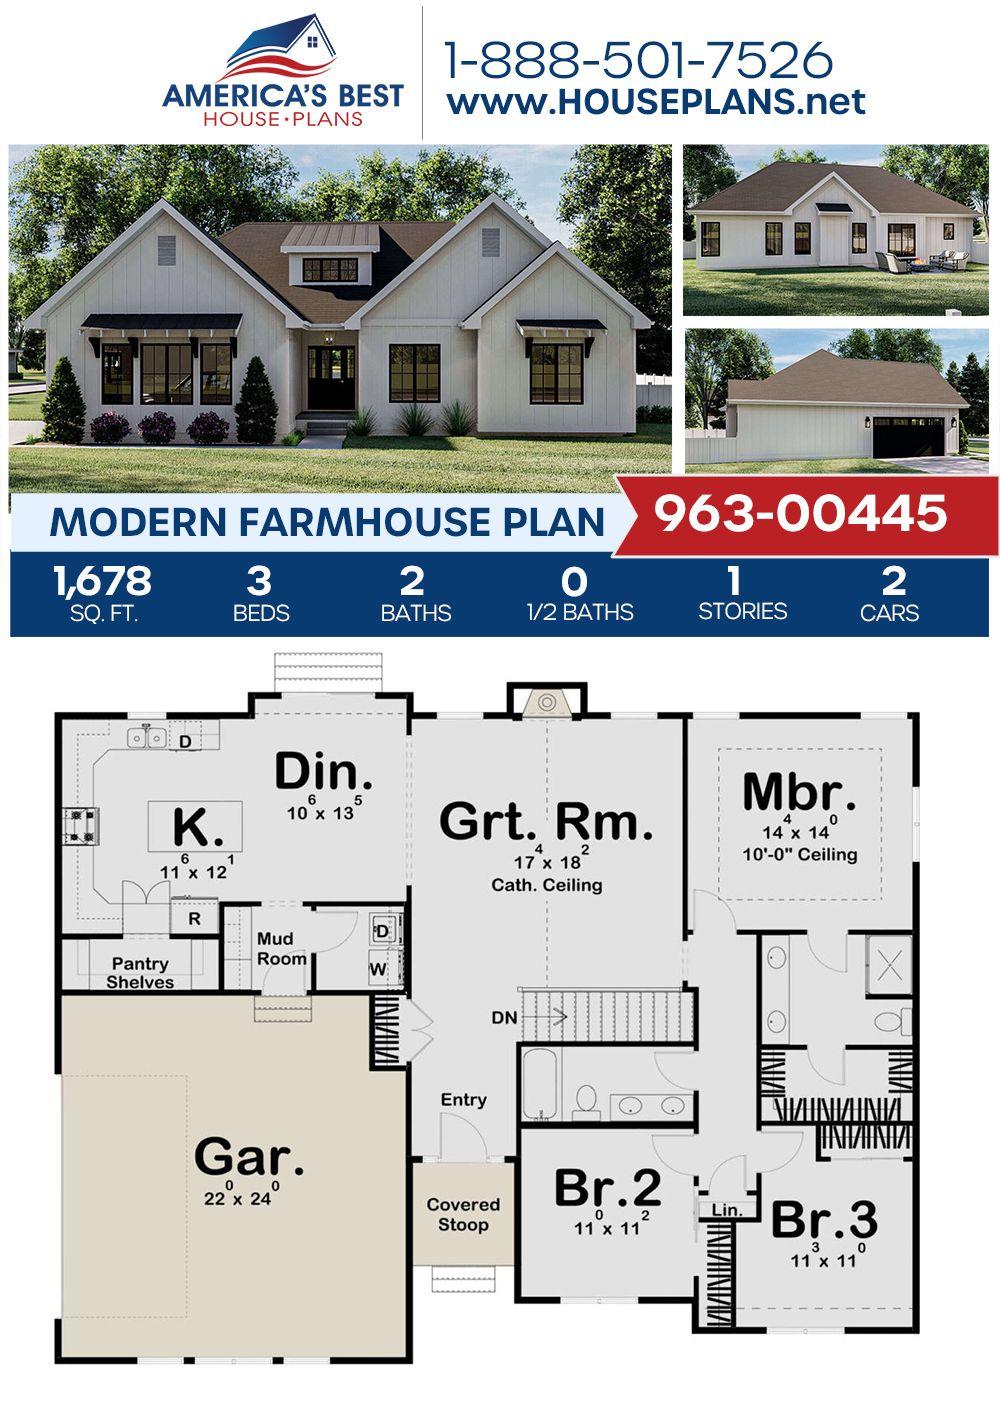 House Plan 963 00445 Modern Farmhouse Plan 1 678 Square Feet 3 Bedrooms 2 Bathrooms Modern Farmhouse Plans House Plans Farmhouse Farmhouse Plans